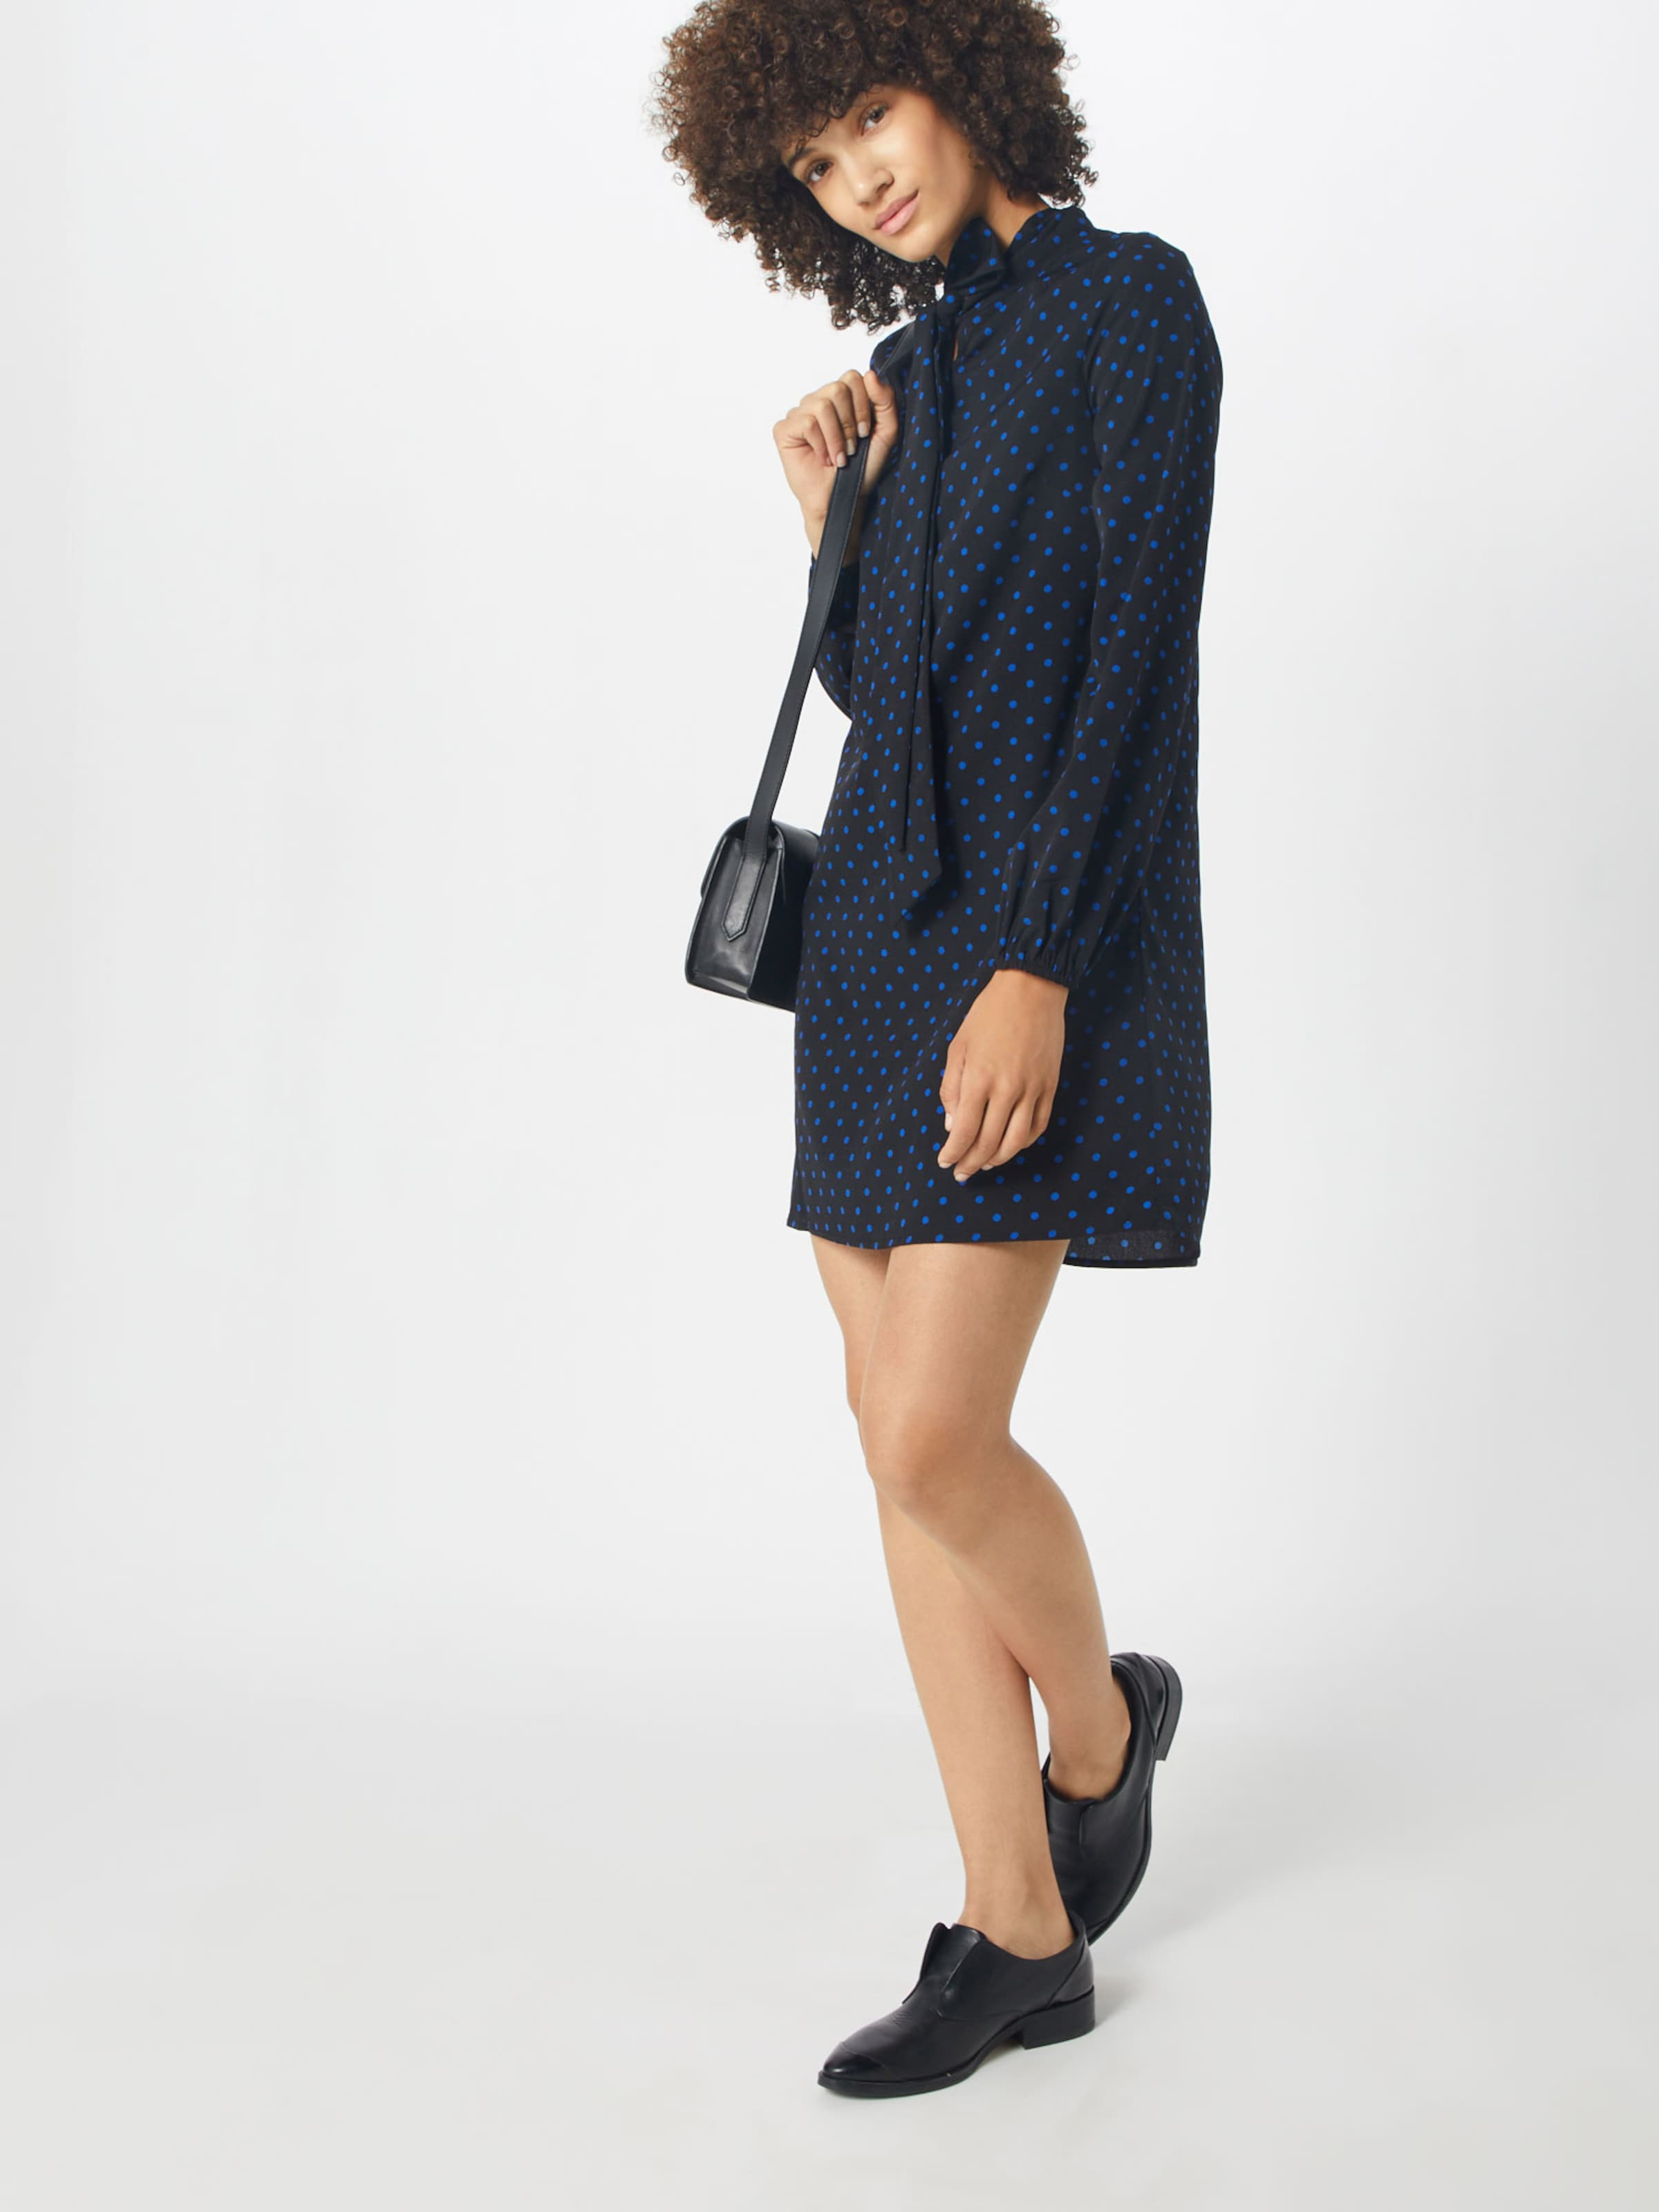 Union Bleu En Robe chemise Fashion 'pj' jA4R35L